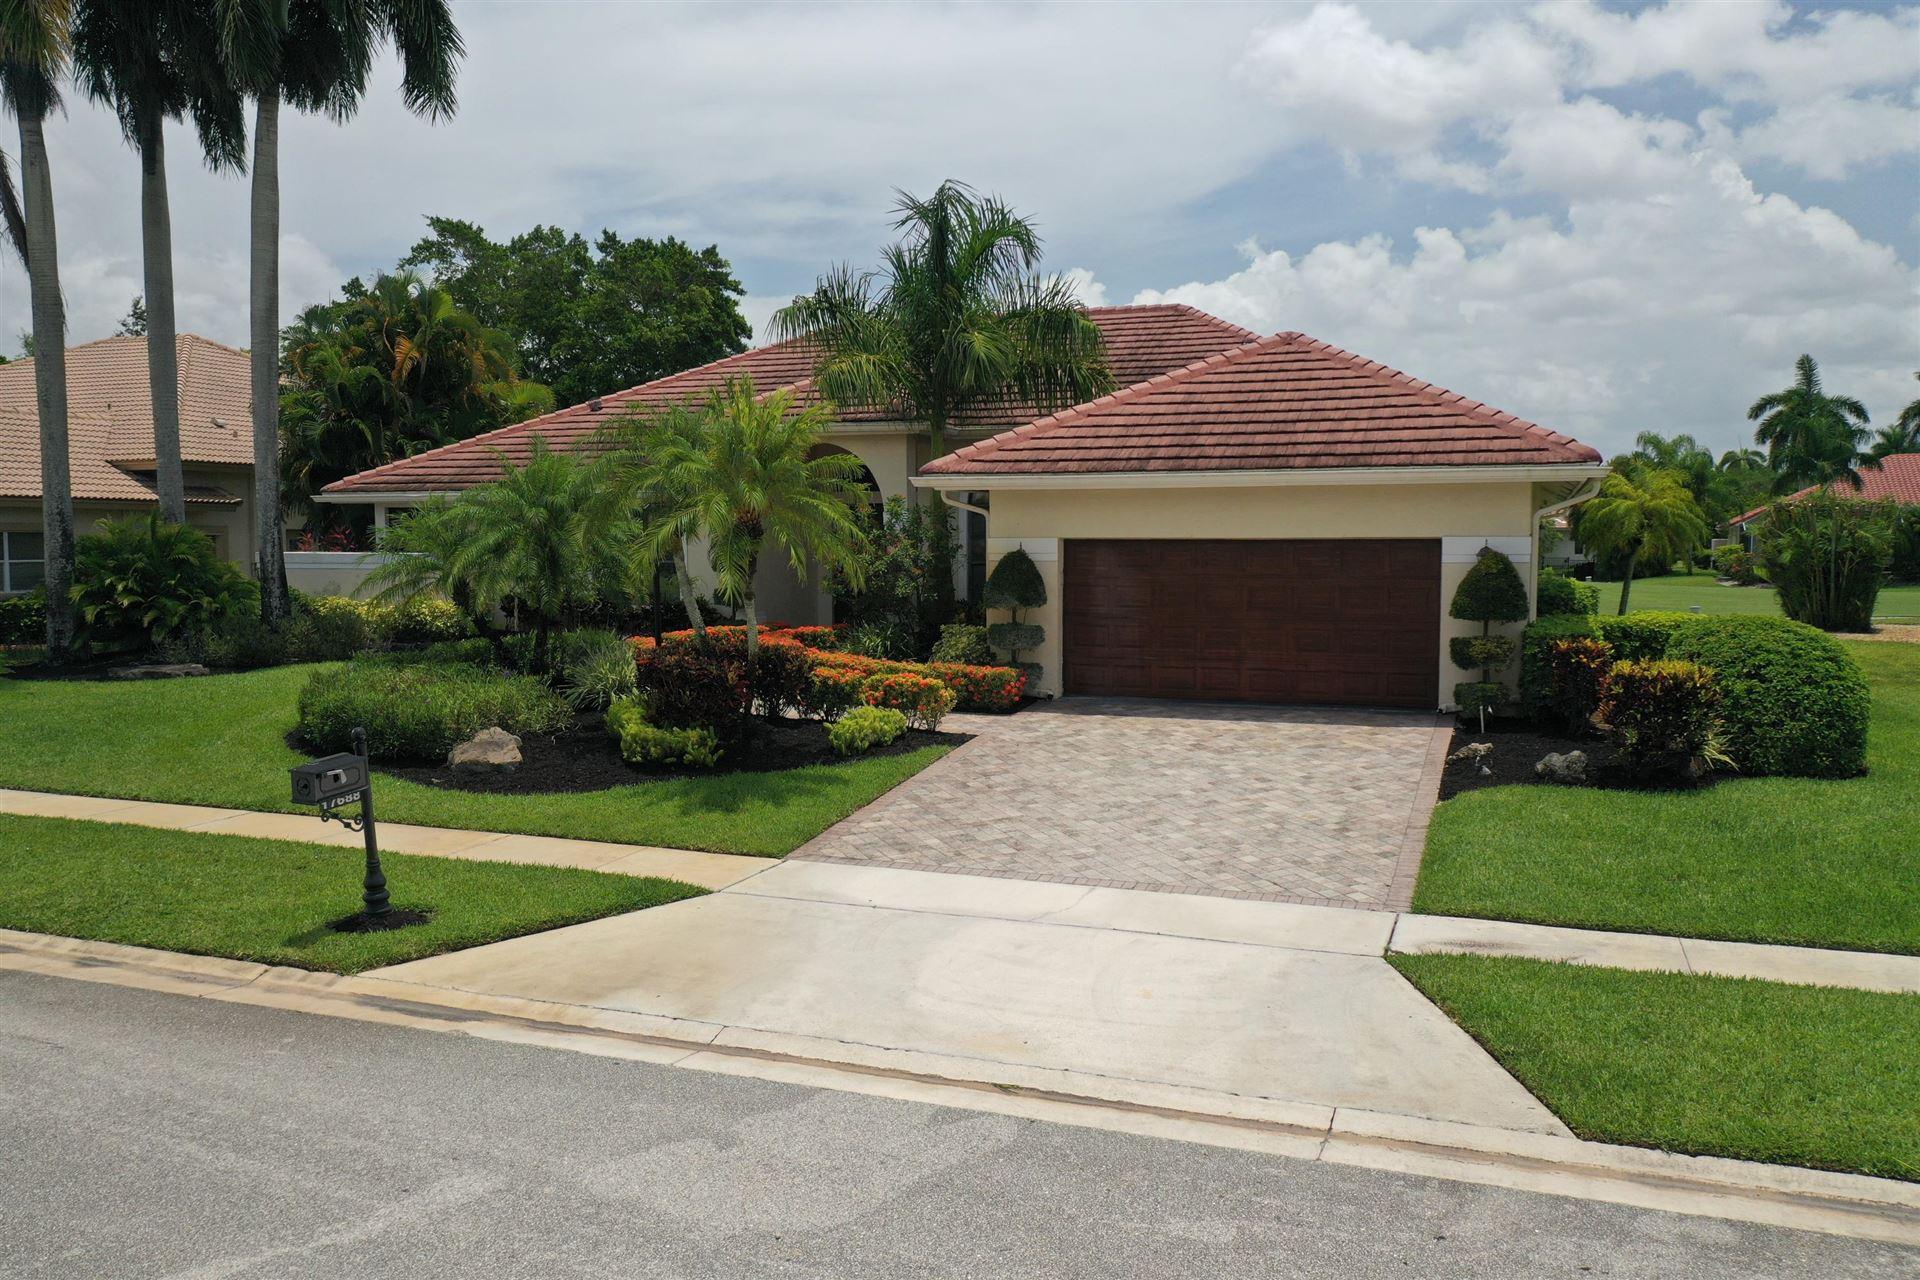 17688 Charnwood Drive, Boca Raton, FL 33498 - #: RX-10637766